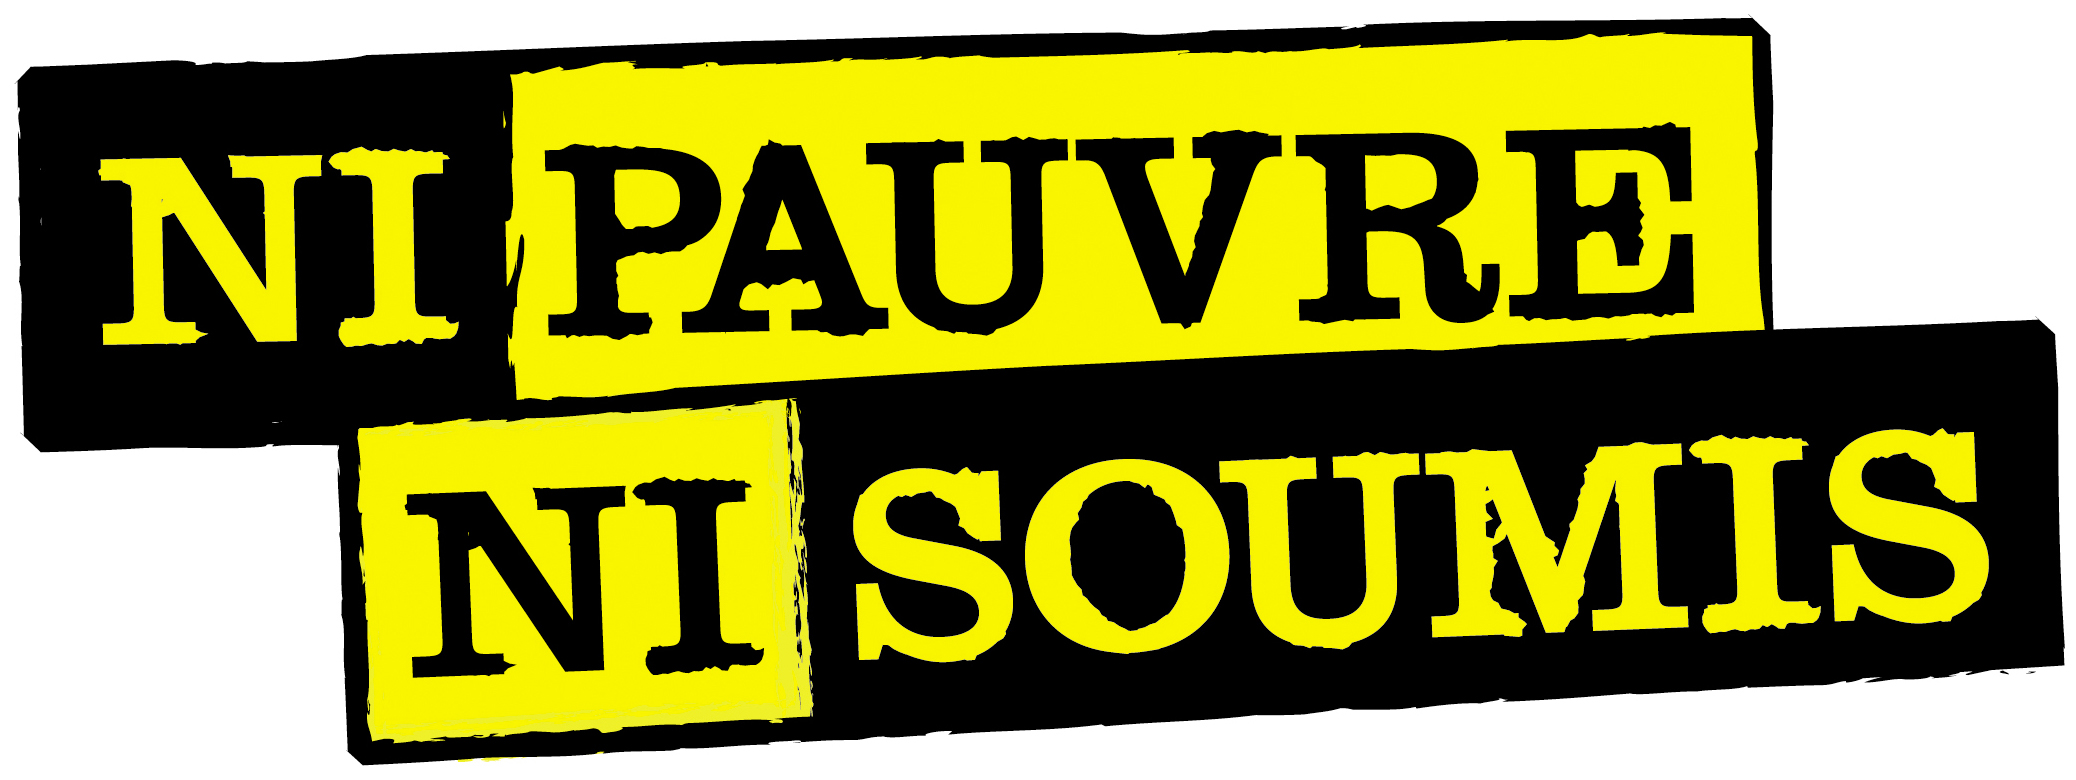 http://www.nipauvrenisoumis.org/media/02/00/0fe6d95663bbebc55b3e0d6b1d273b4a.jpg